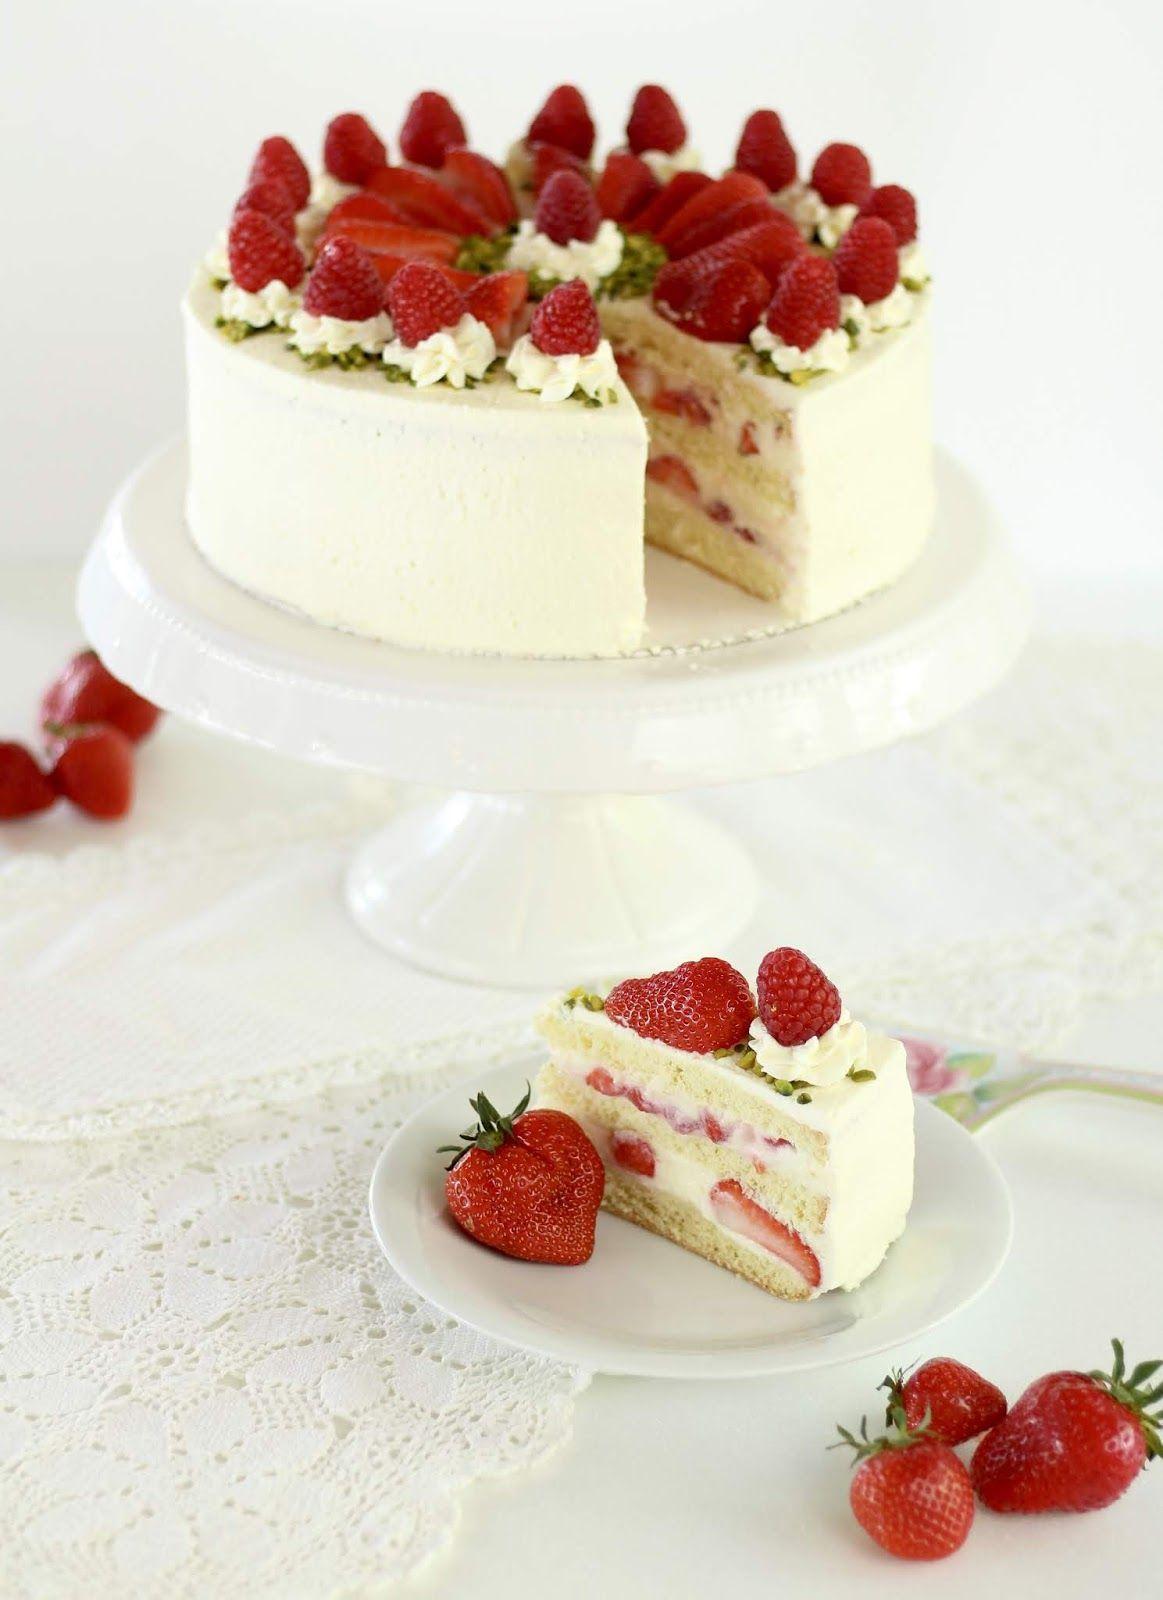 Erdbeer Biskuit Torte Mit Sahne Joghurt Mousse Au Chocolat In 2020 Bakery Cakes Fudge Recipes Microwave Fudge